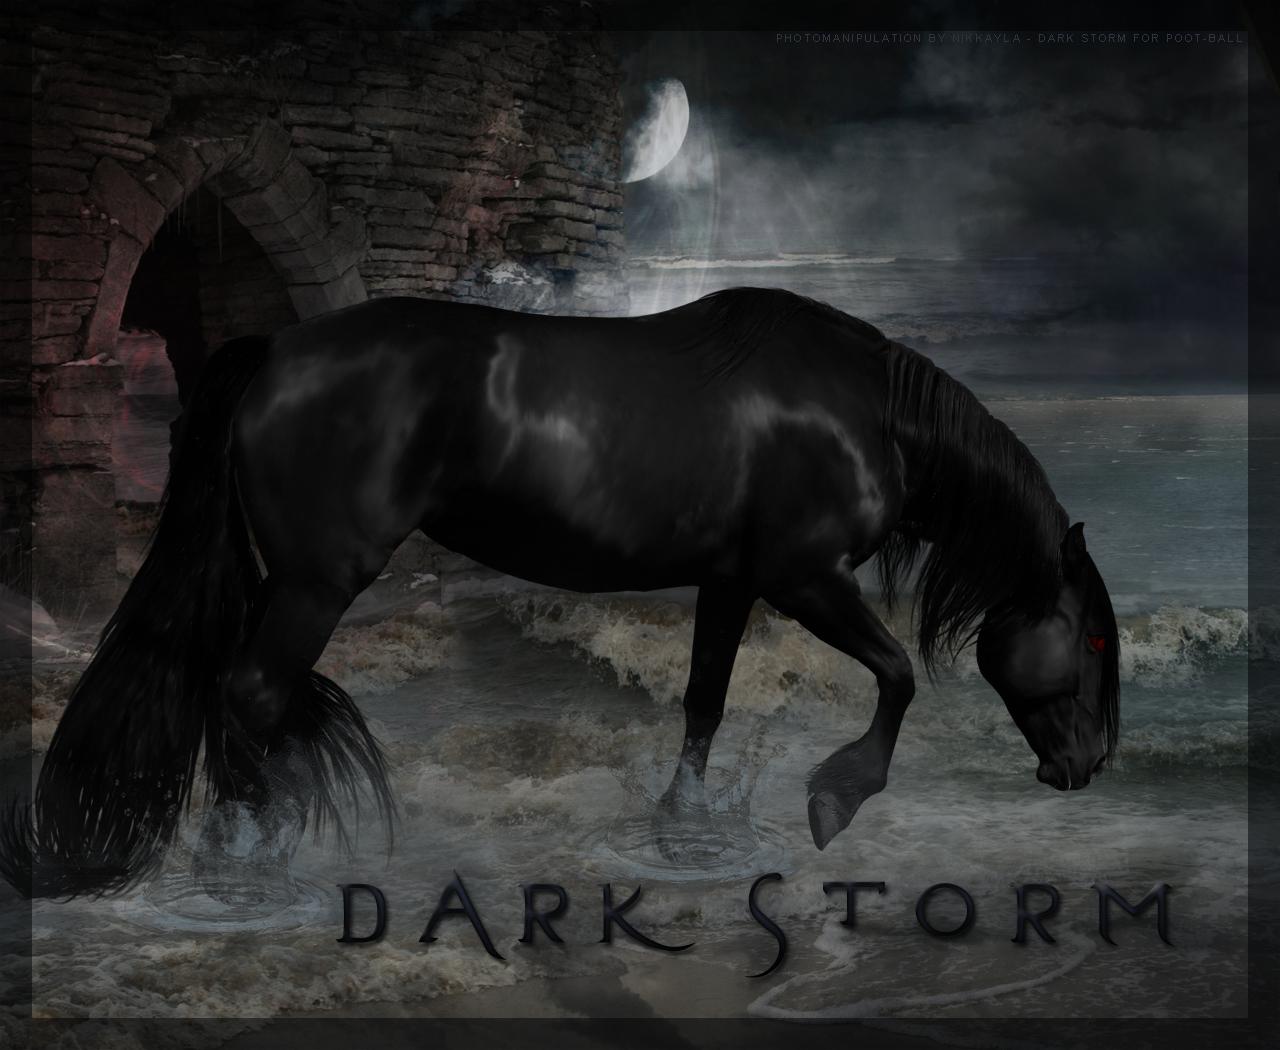 dark storn le démon !! 3a97e40b1839160c